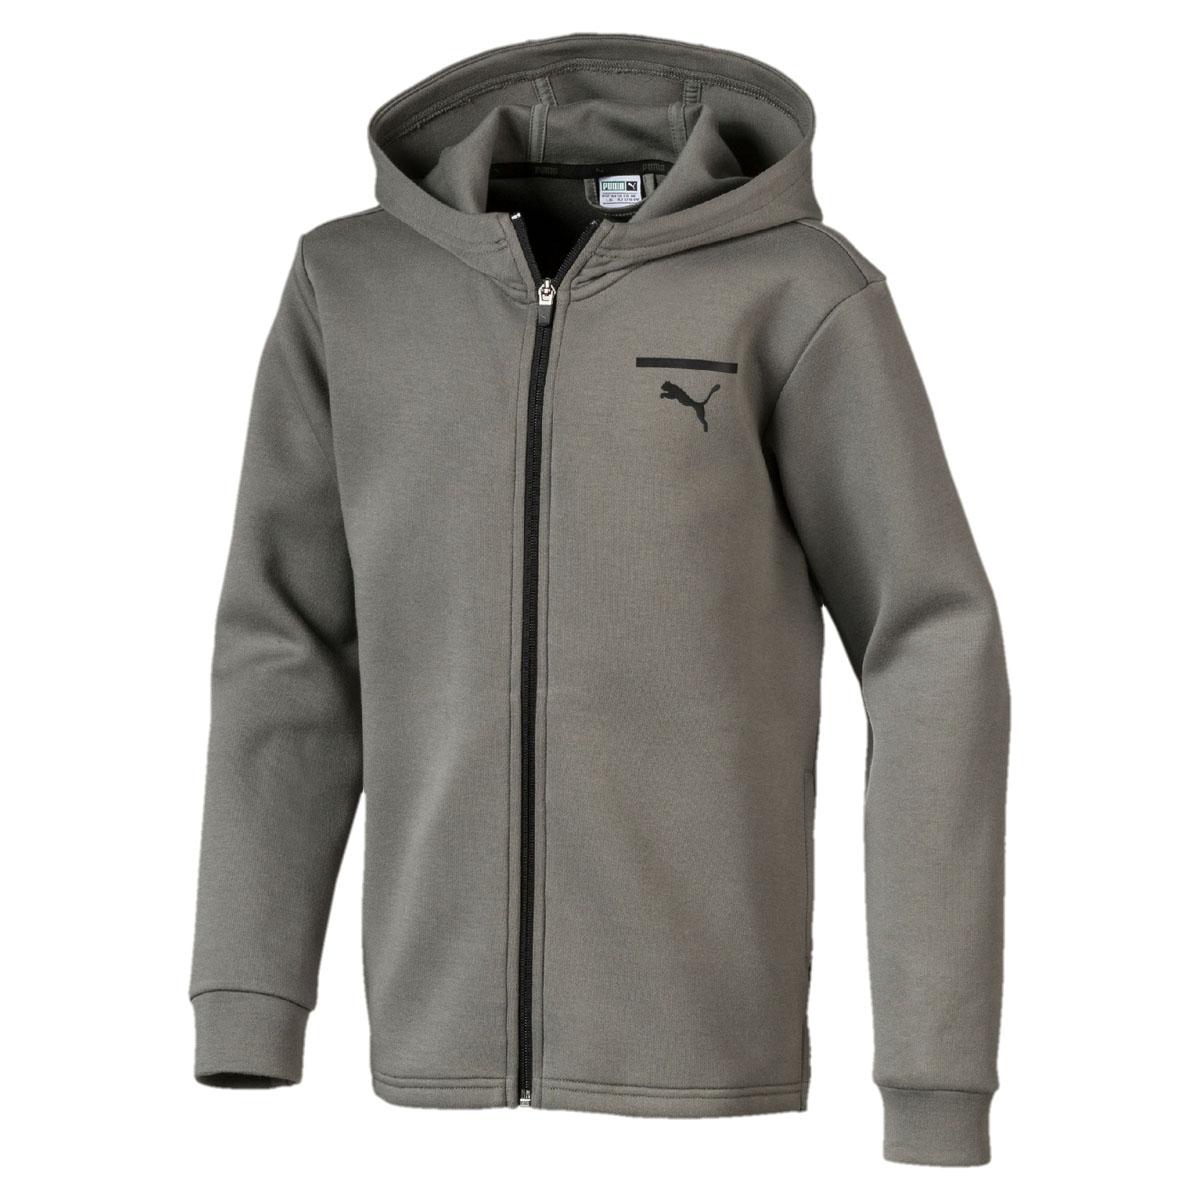 Толстовка для мальчика Puma Pace FZ Hoody, цвет: серый. 850247397. Размер 164 original new arrival 2018 puma pace primary fz hoody men s jacket sportswear